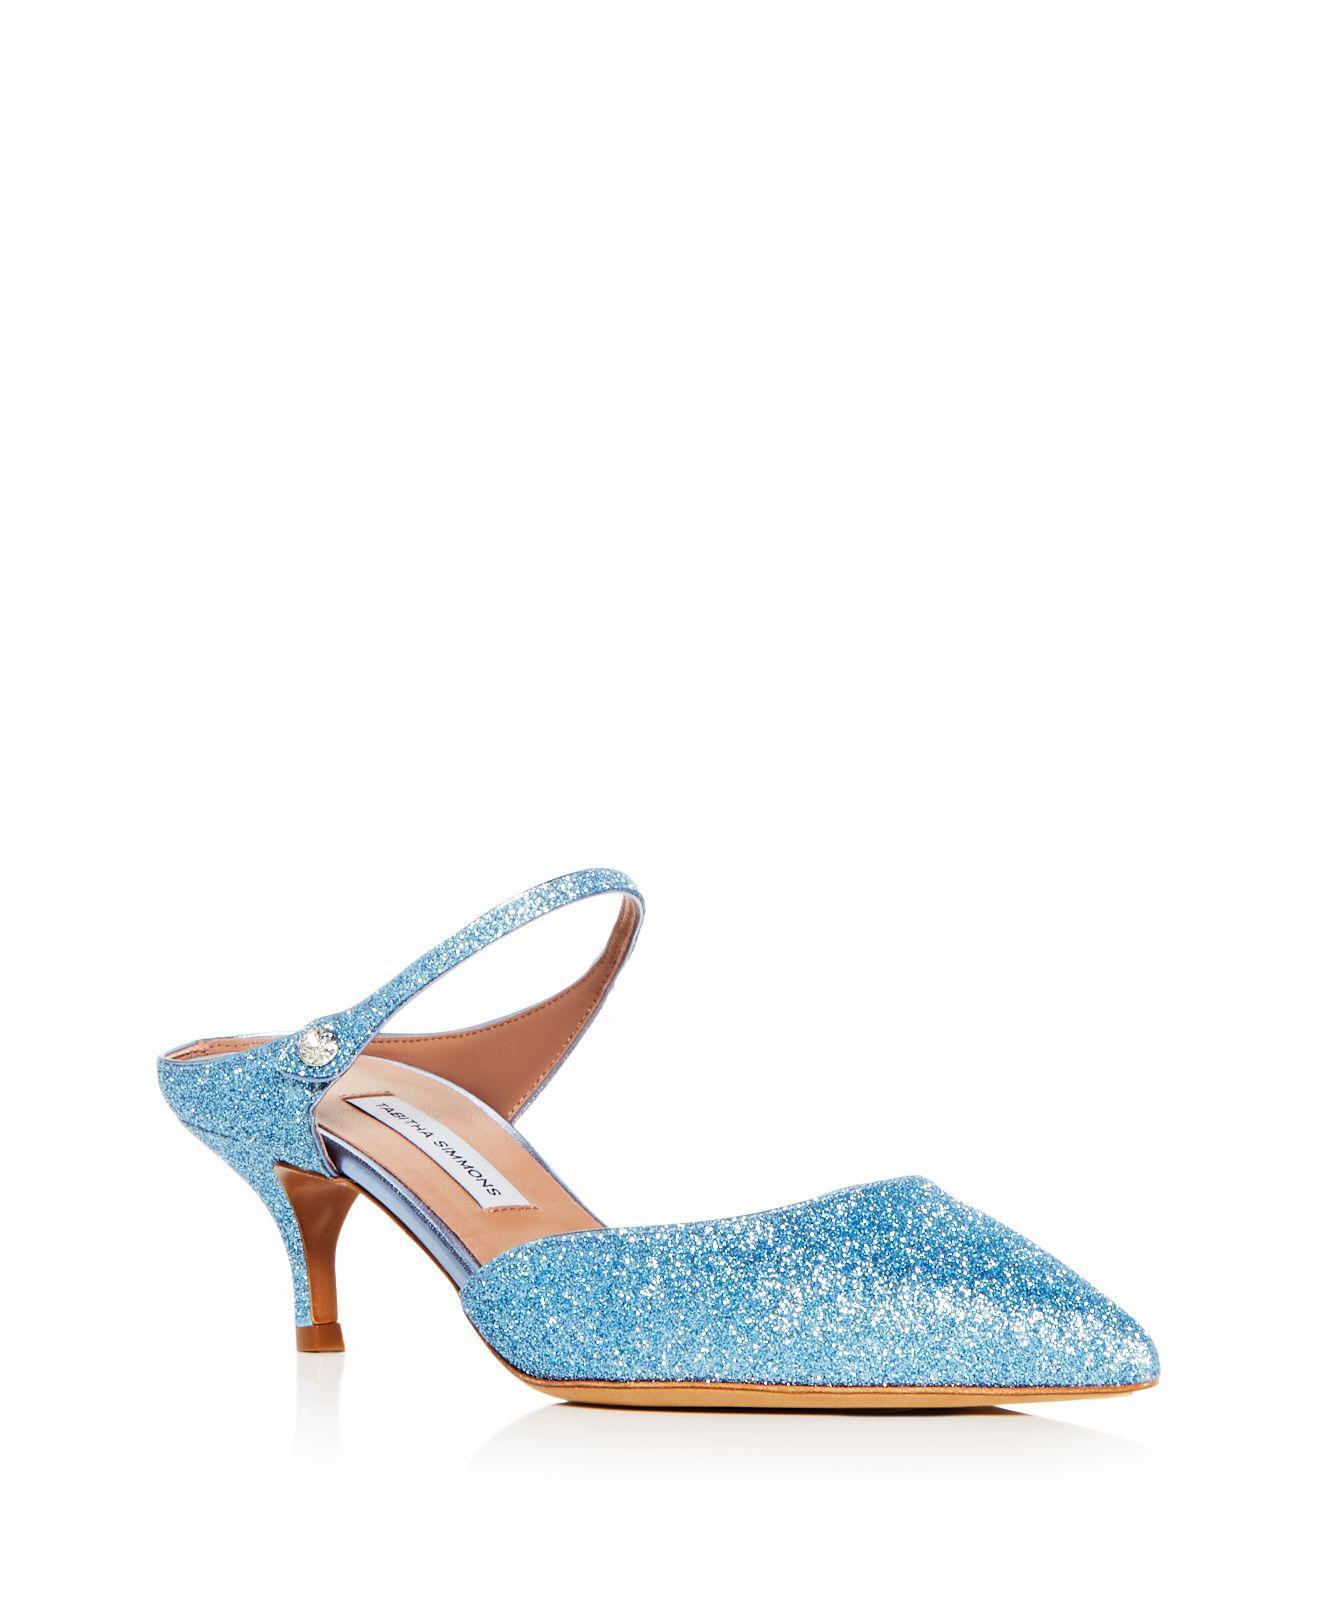 Tabitha Simmons Women's Liberty Glitter Pointed Toe Kitten Heel Mules IBOTb6xt